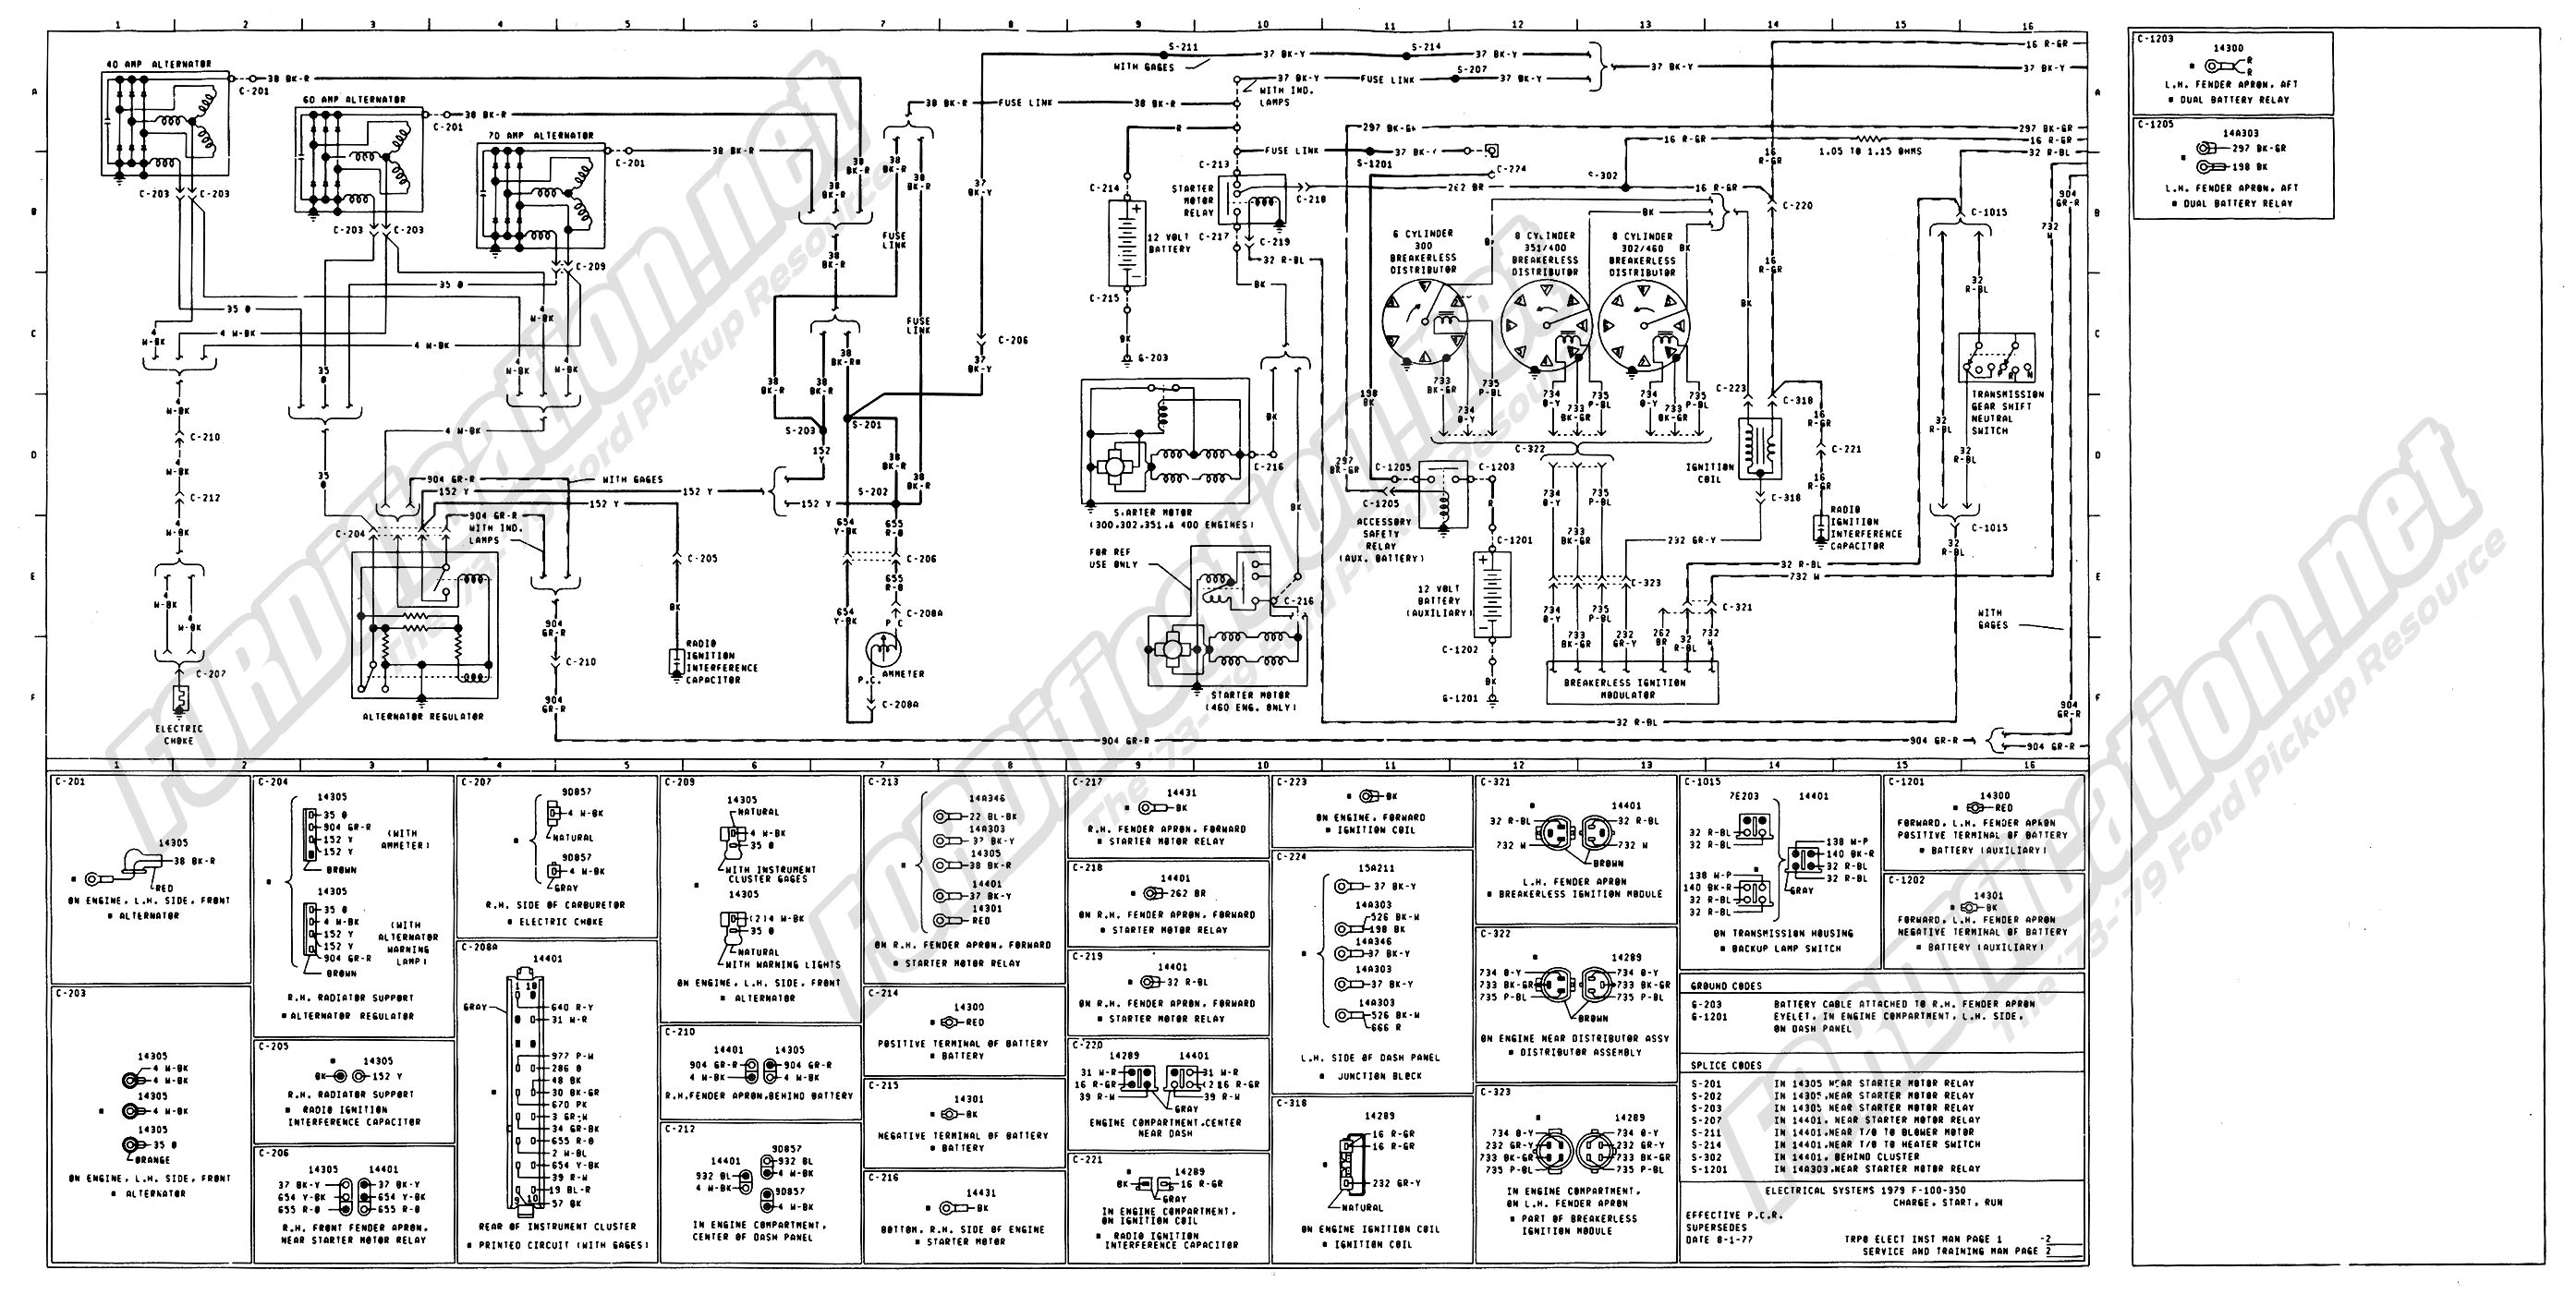 1992 ford f700 fuse box location